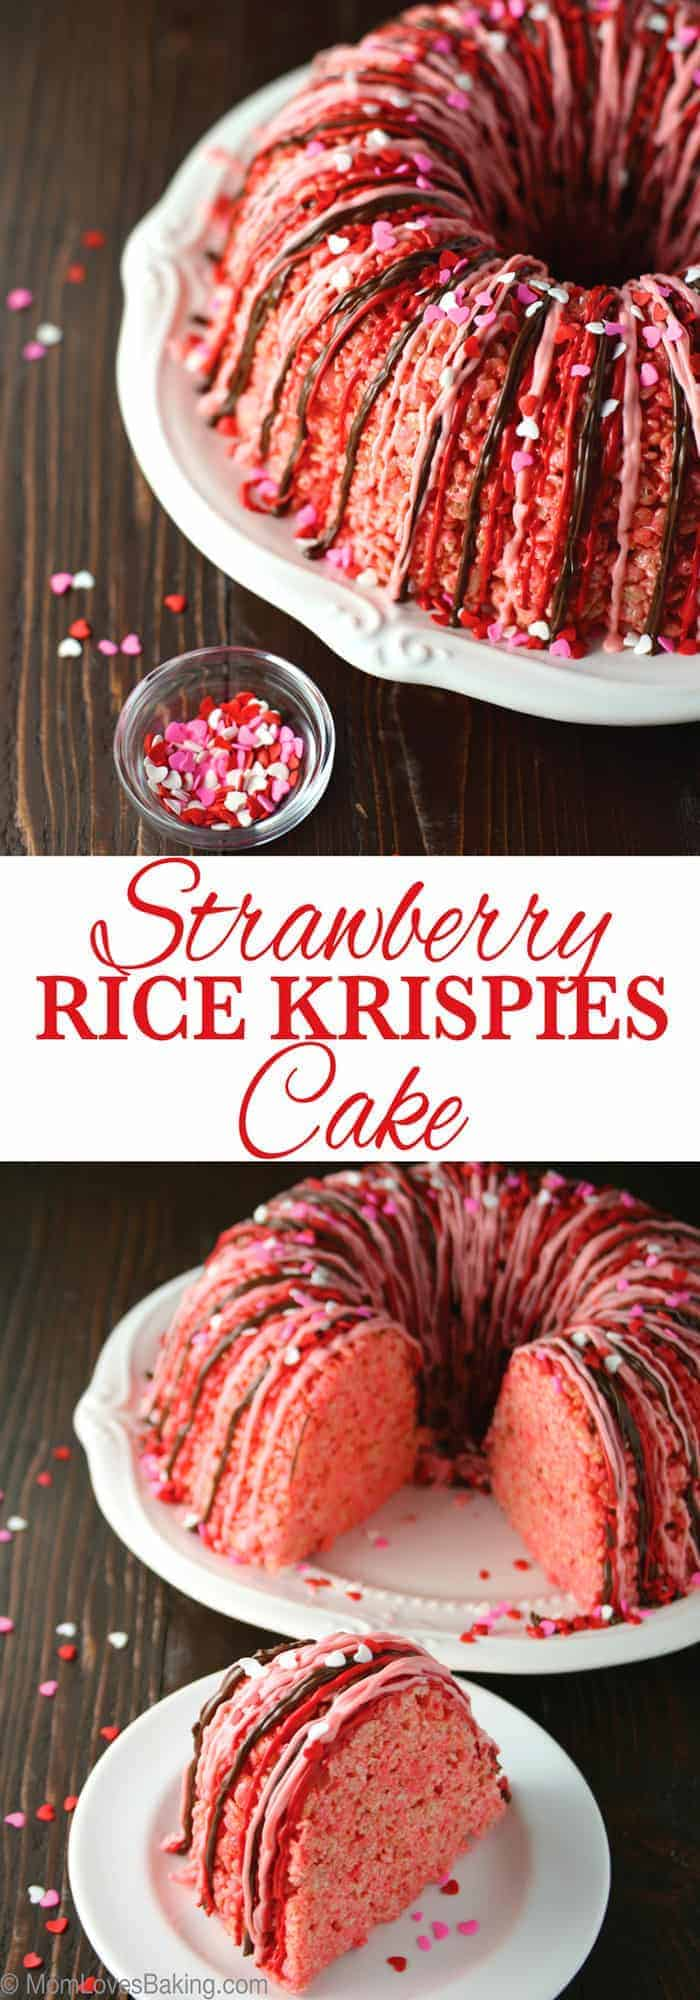 Strawberry Rice Krispies Cake